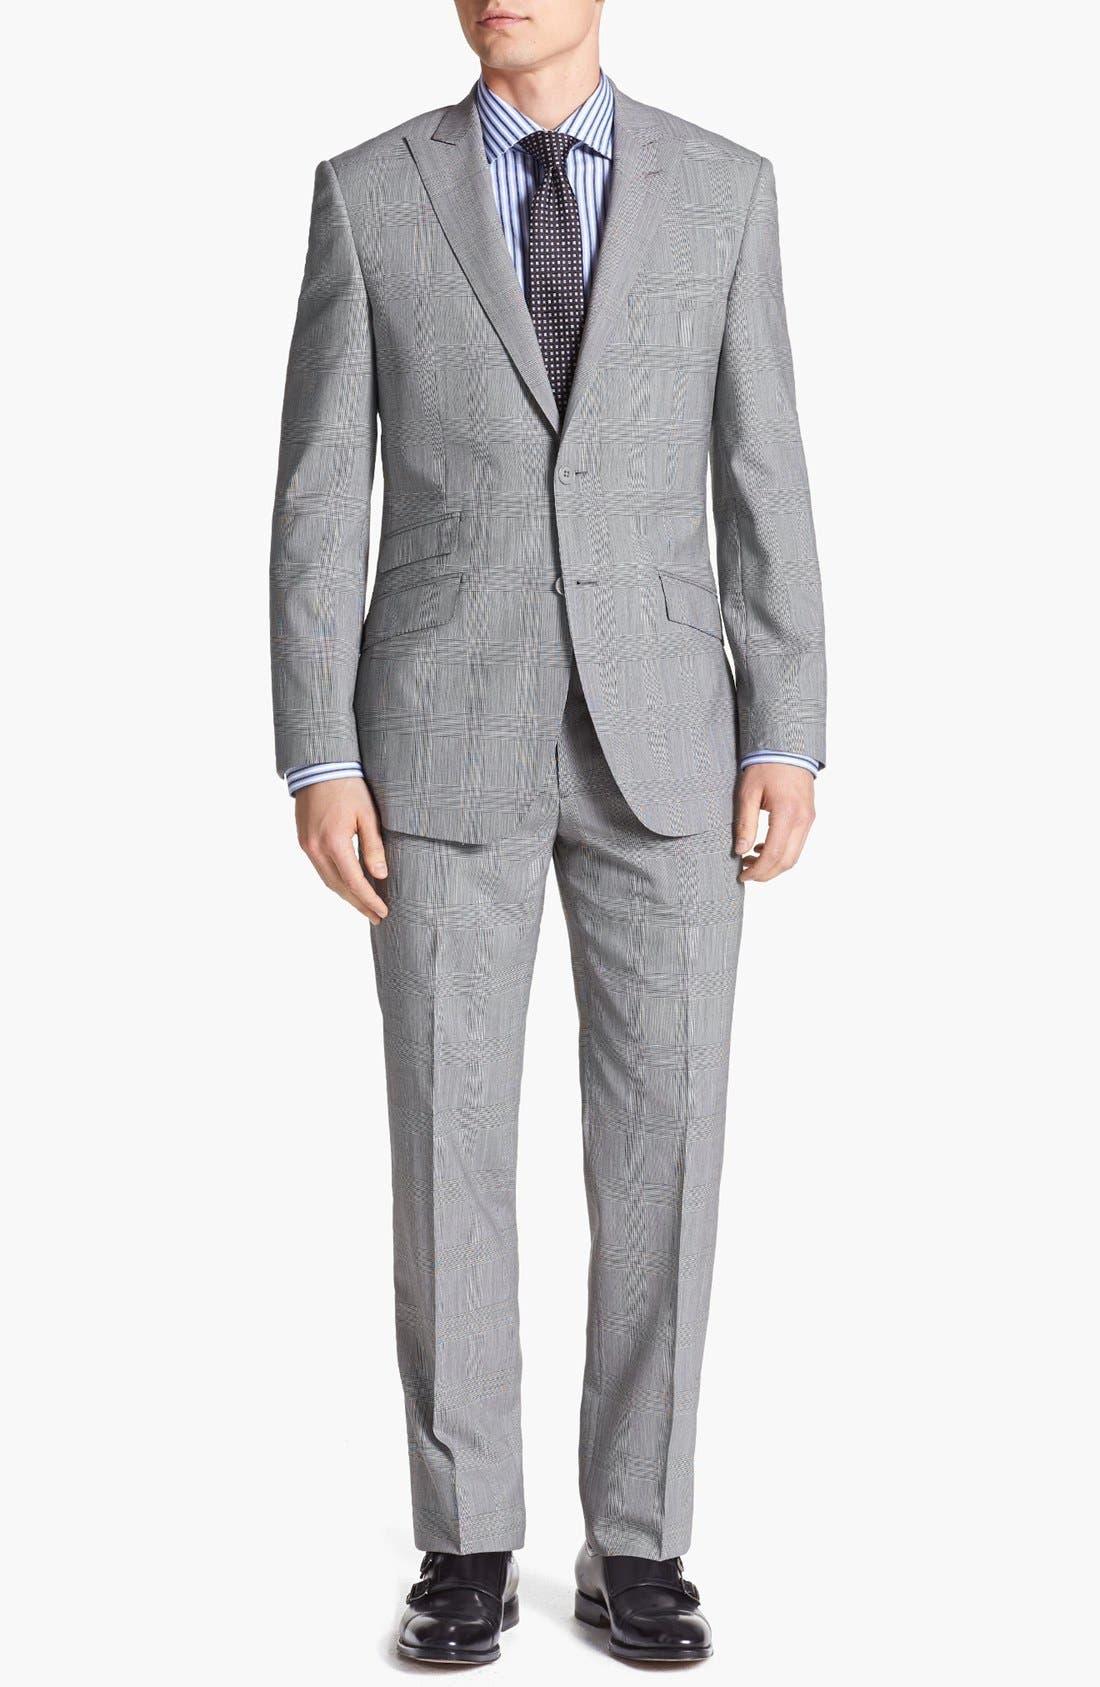 Alternate Image 1 Selected - English Laundry Trim Fit Plaid Suit